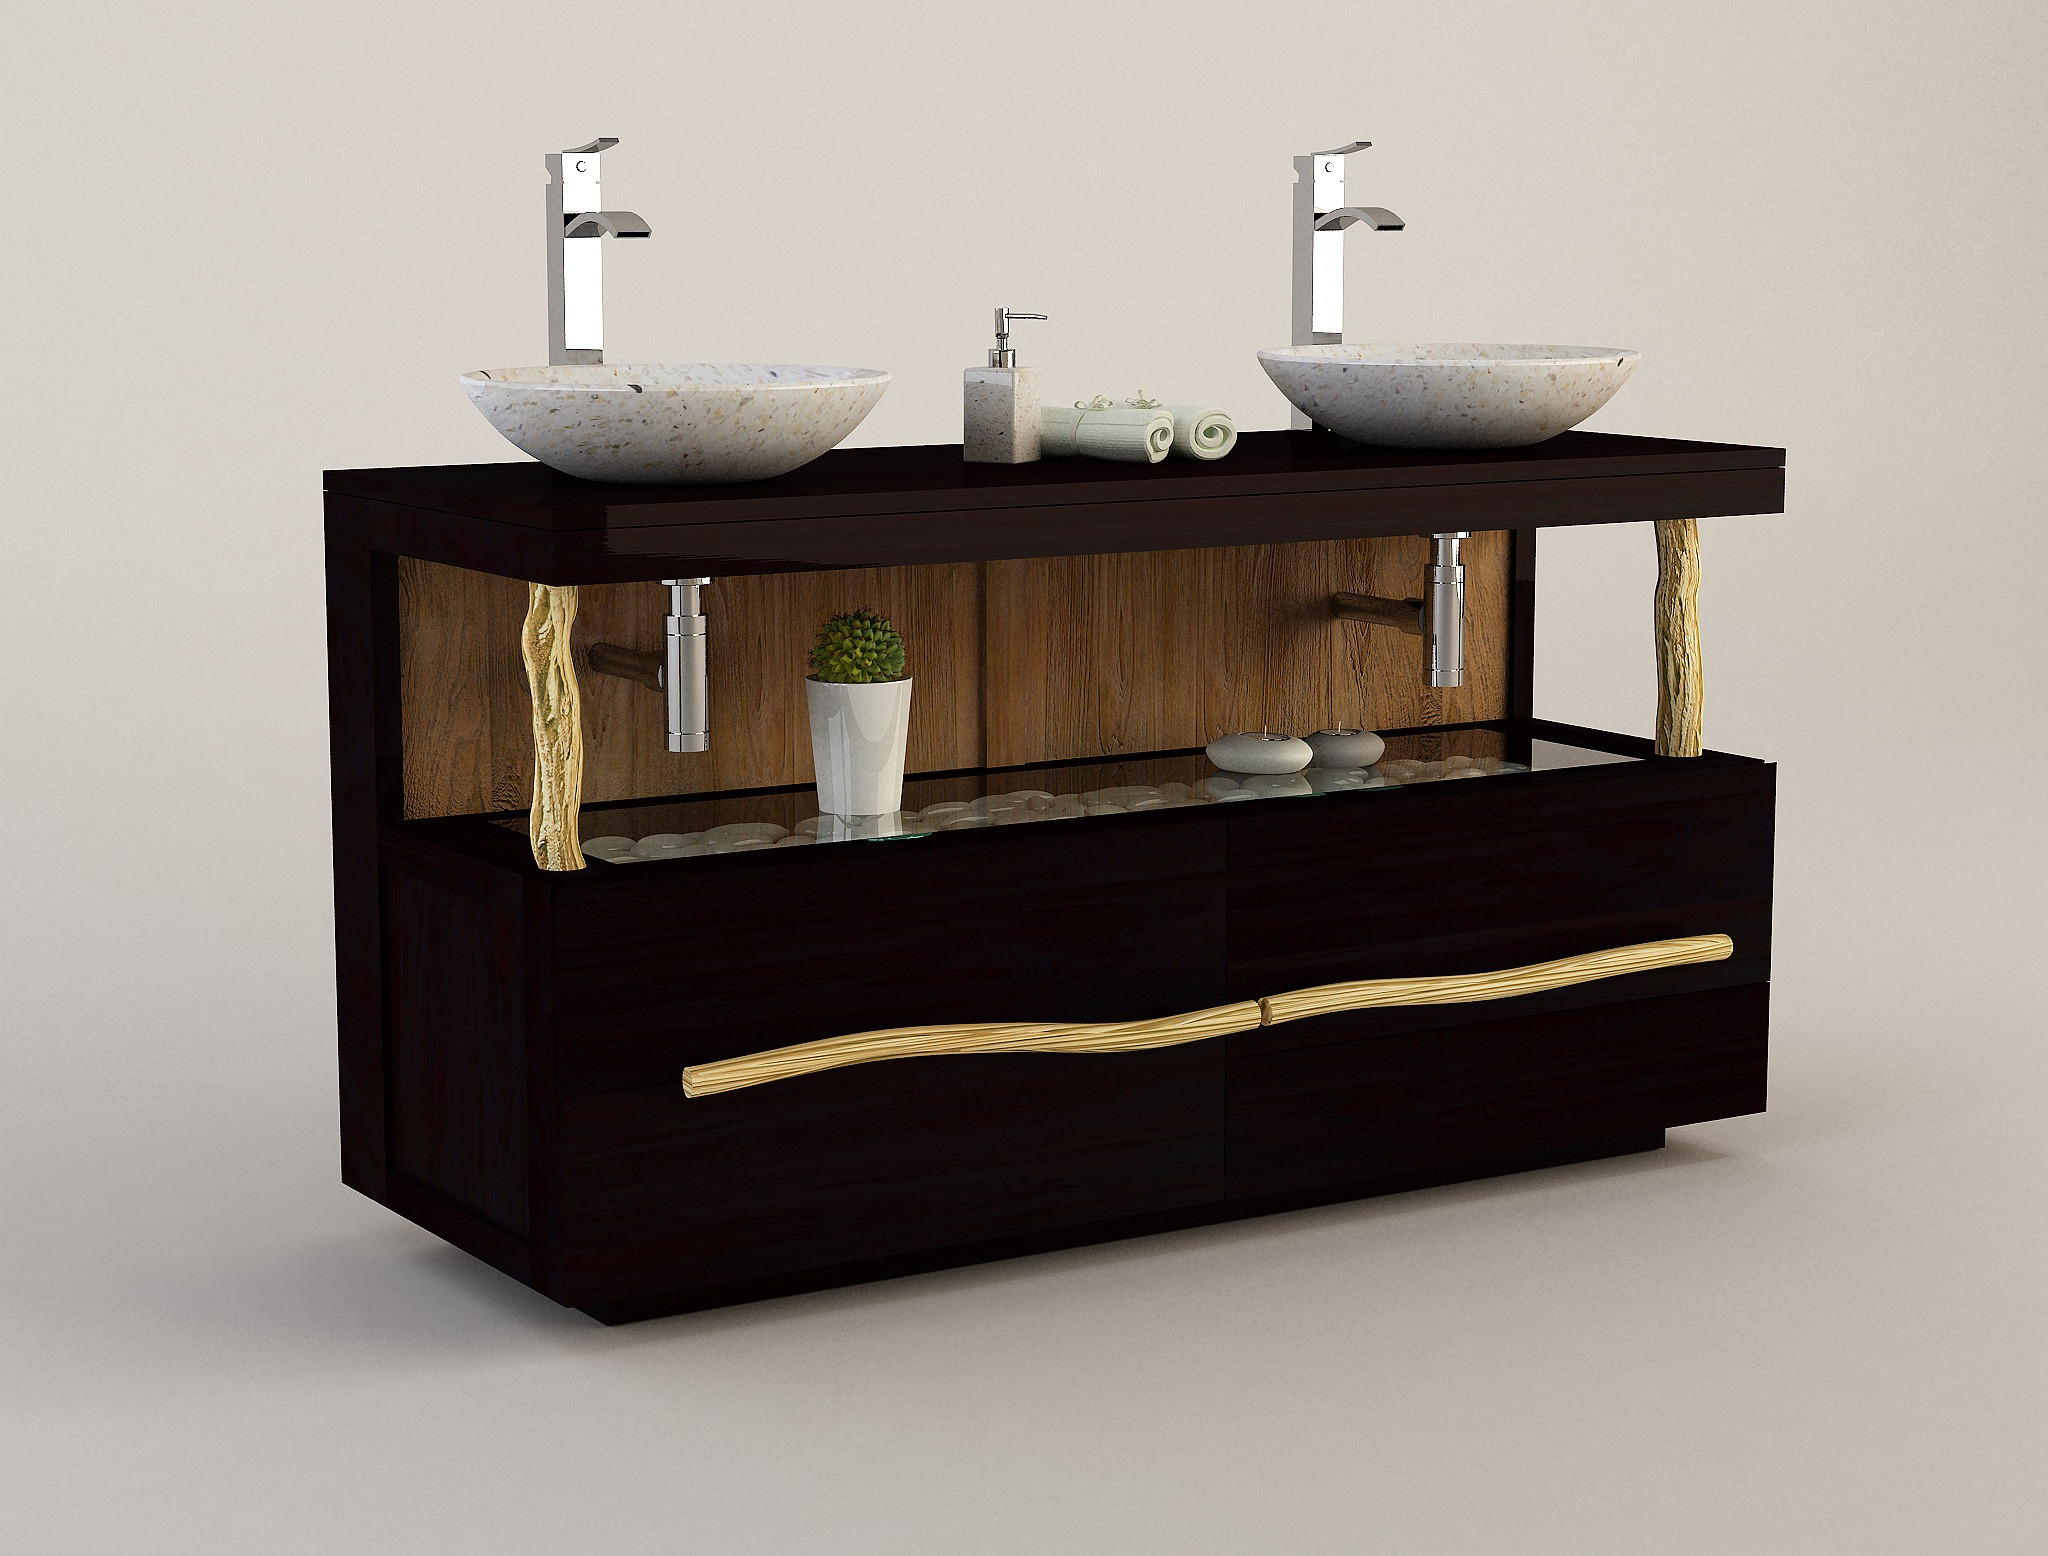 salle de bains teck beautiful cuisine meuble salle de bain en teck avec meuble teck salle de. Black Bedroom Furniture Sets. Home Design Ideas